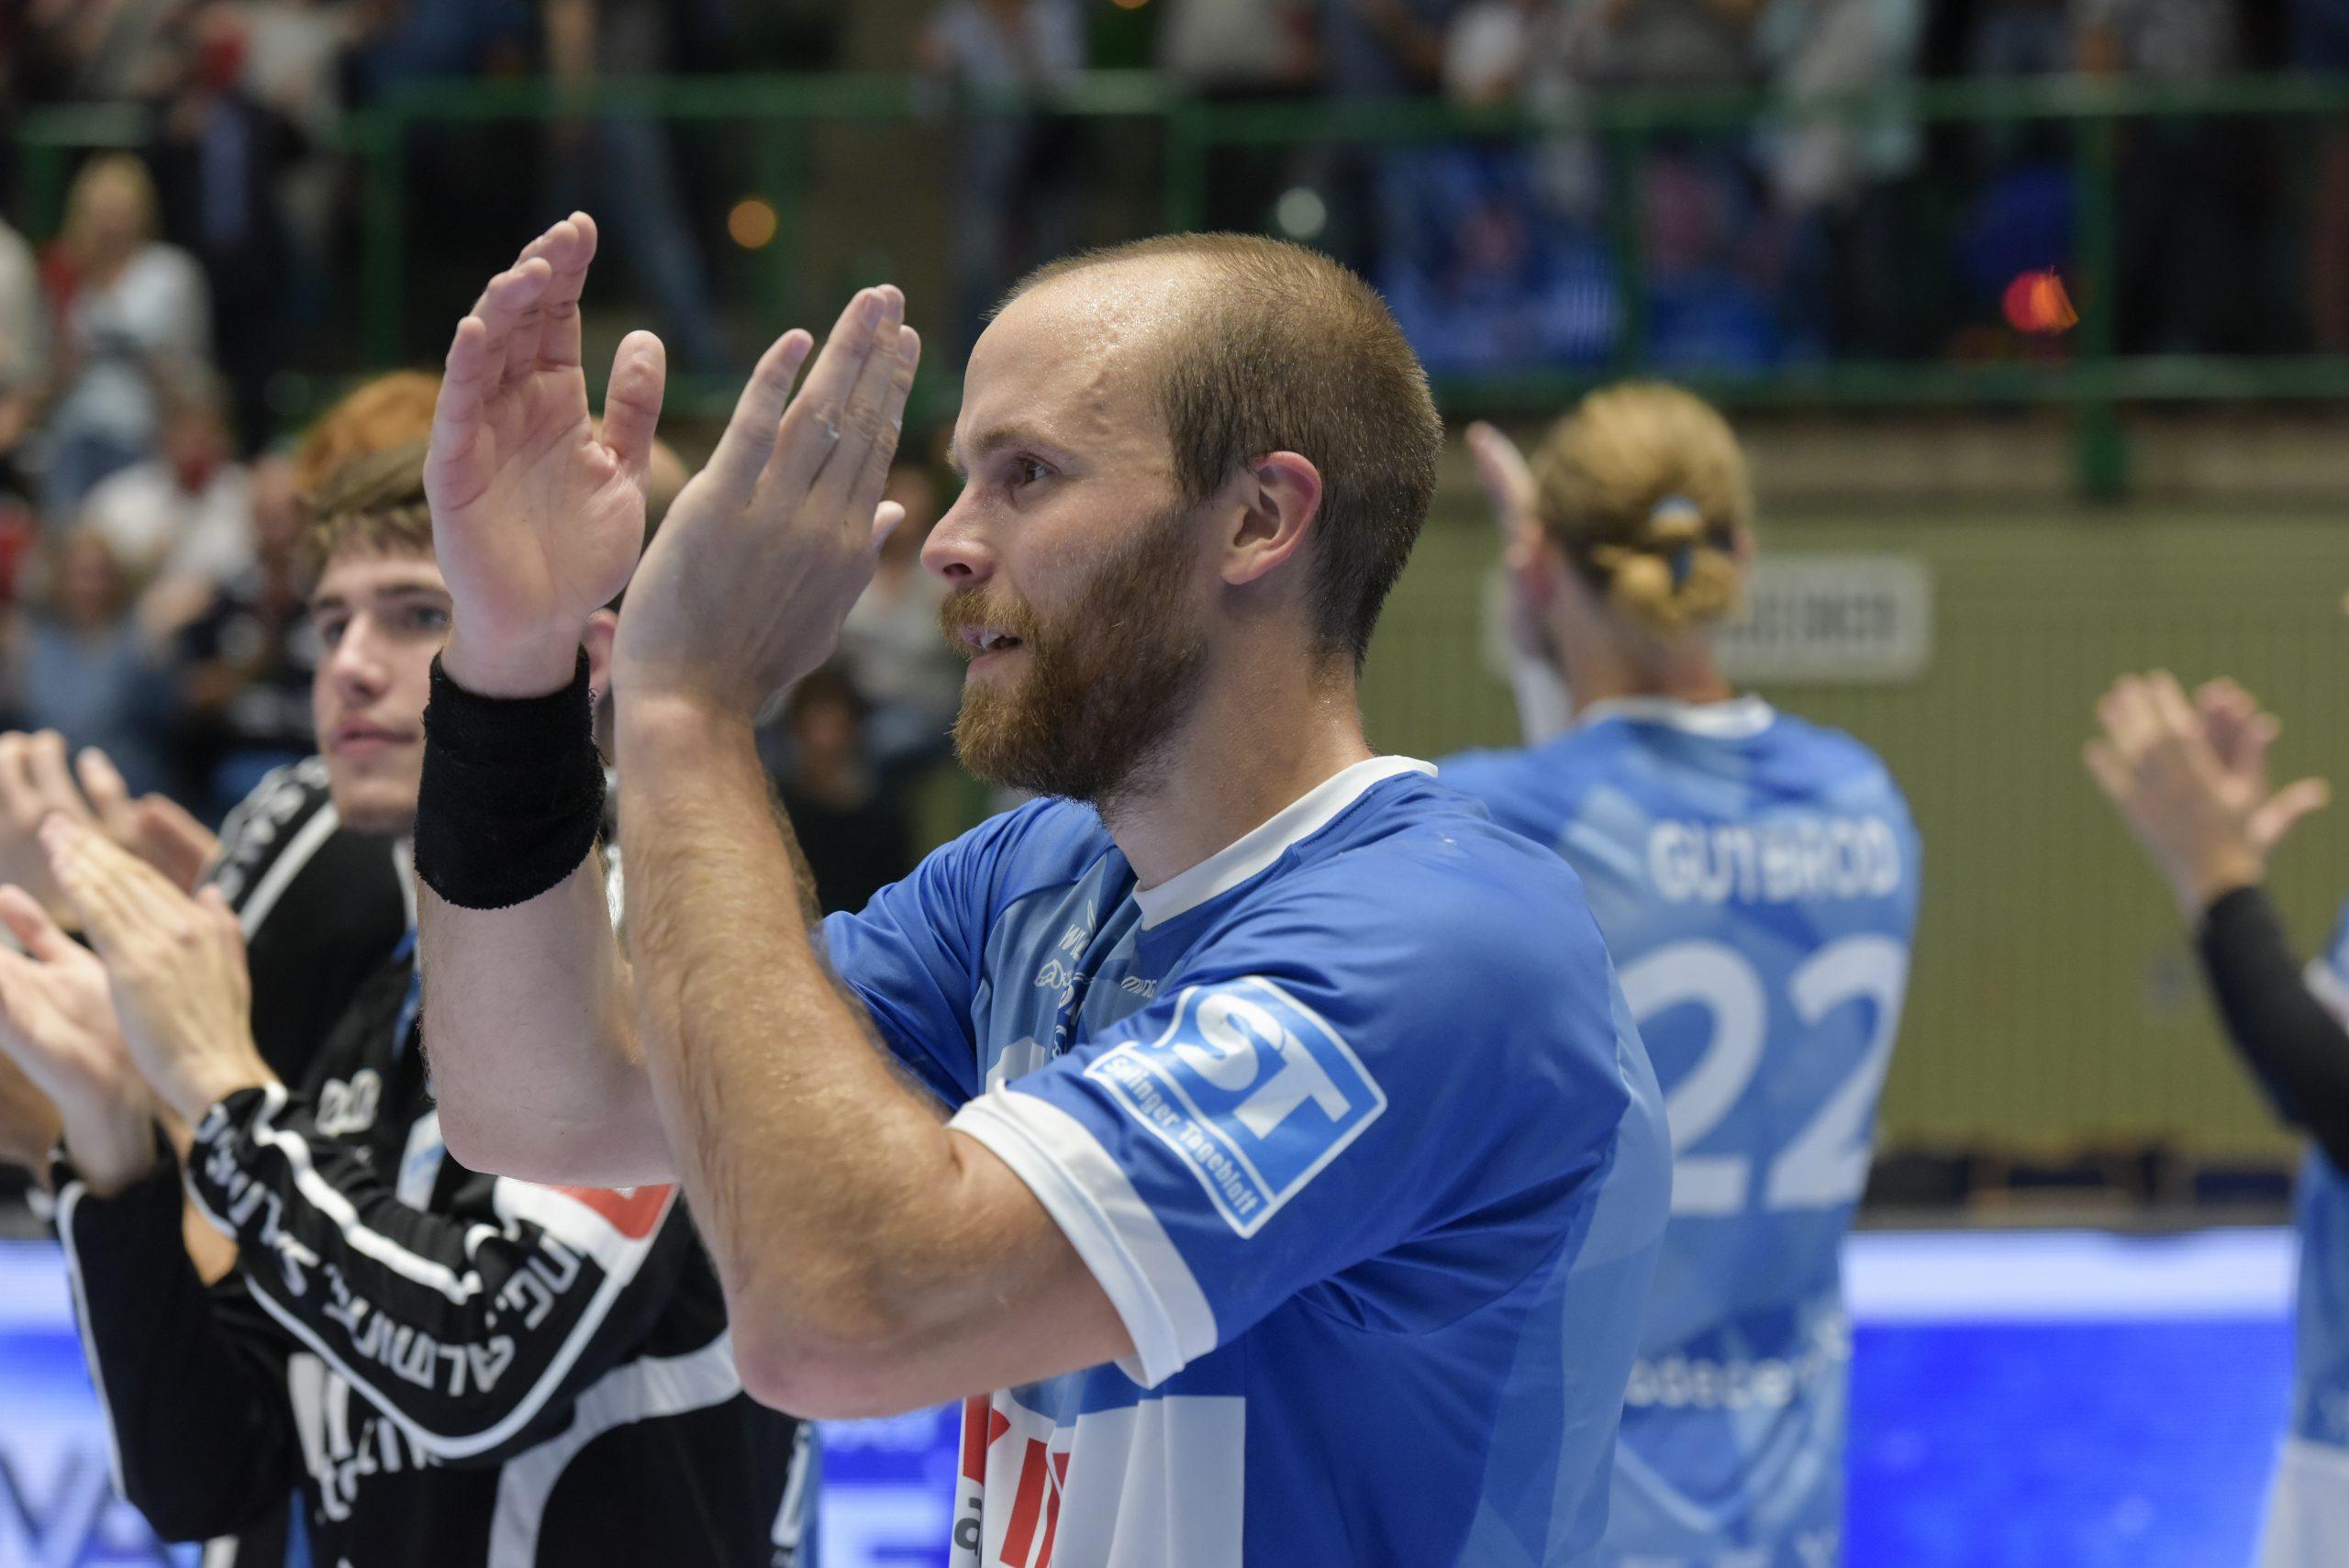 Kristian Nippes